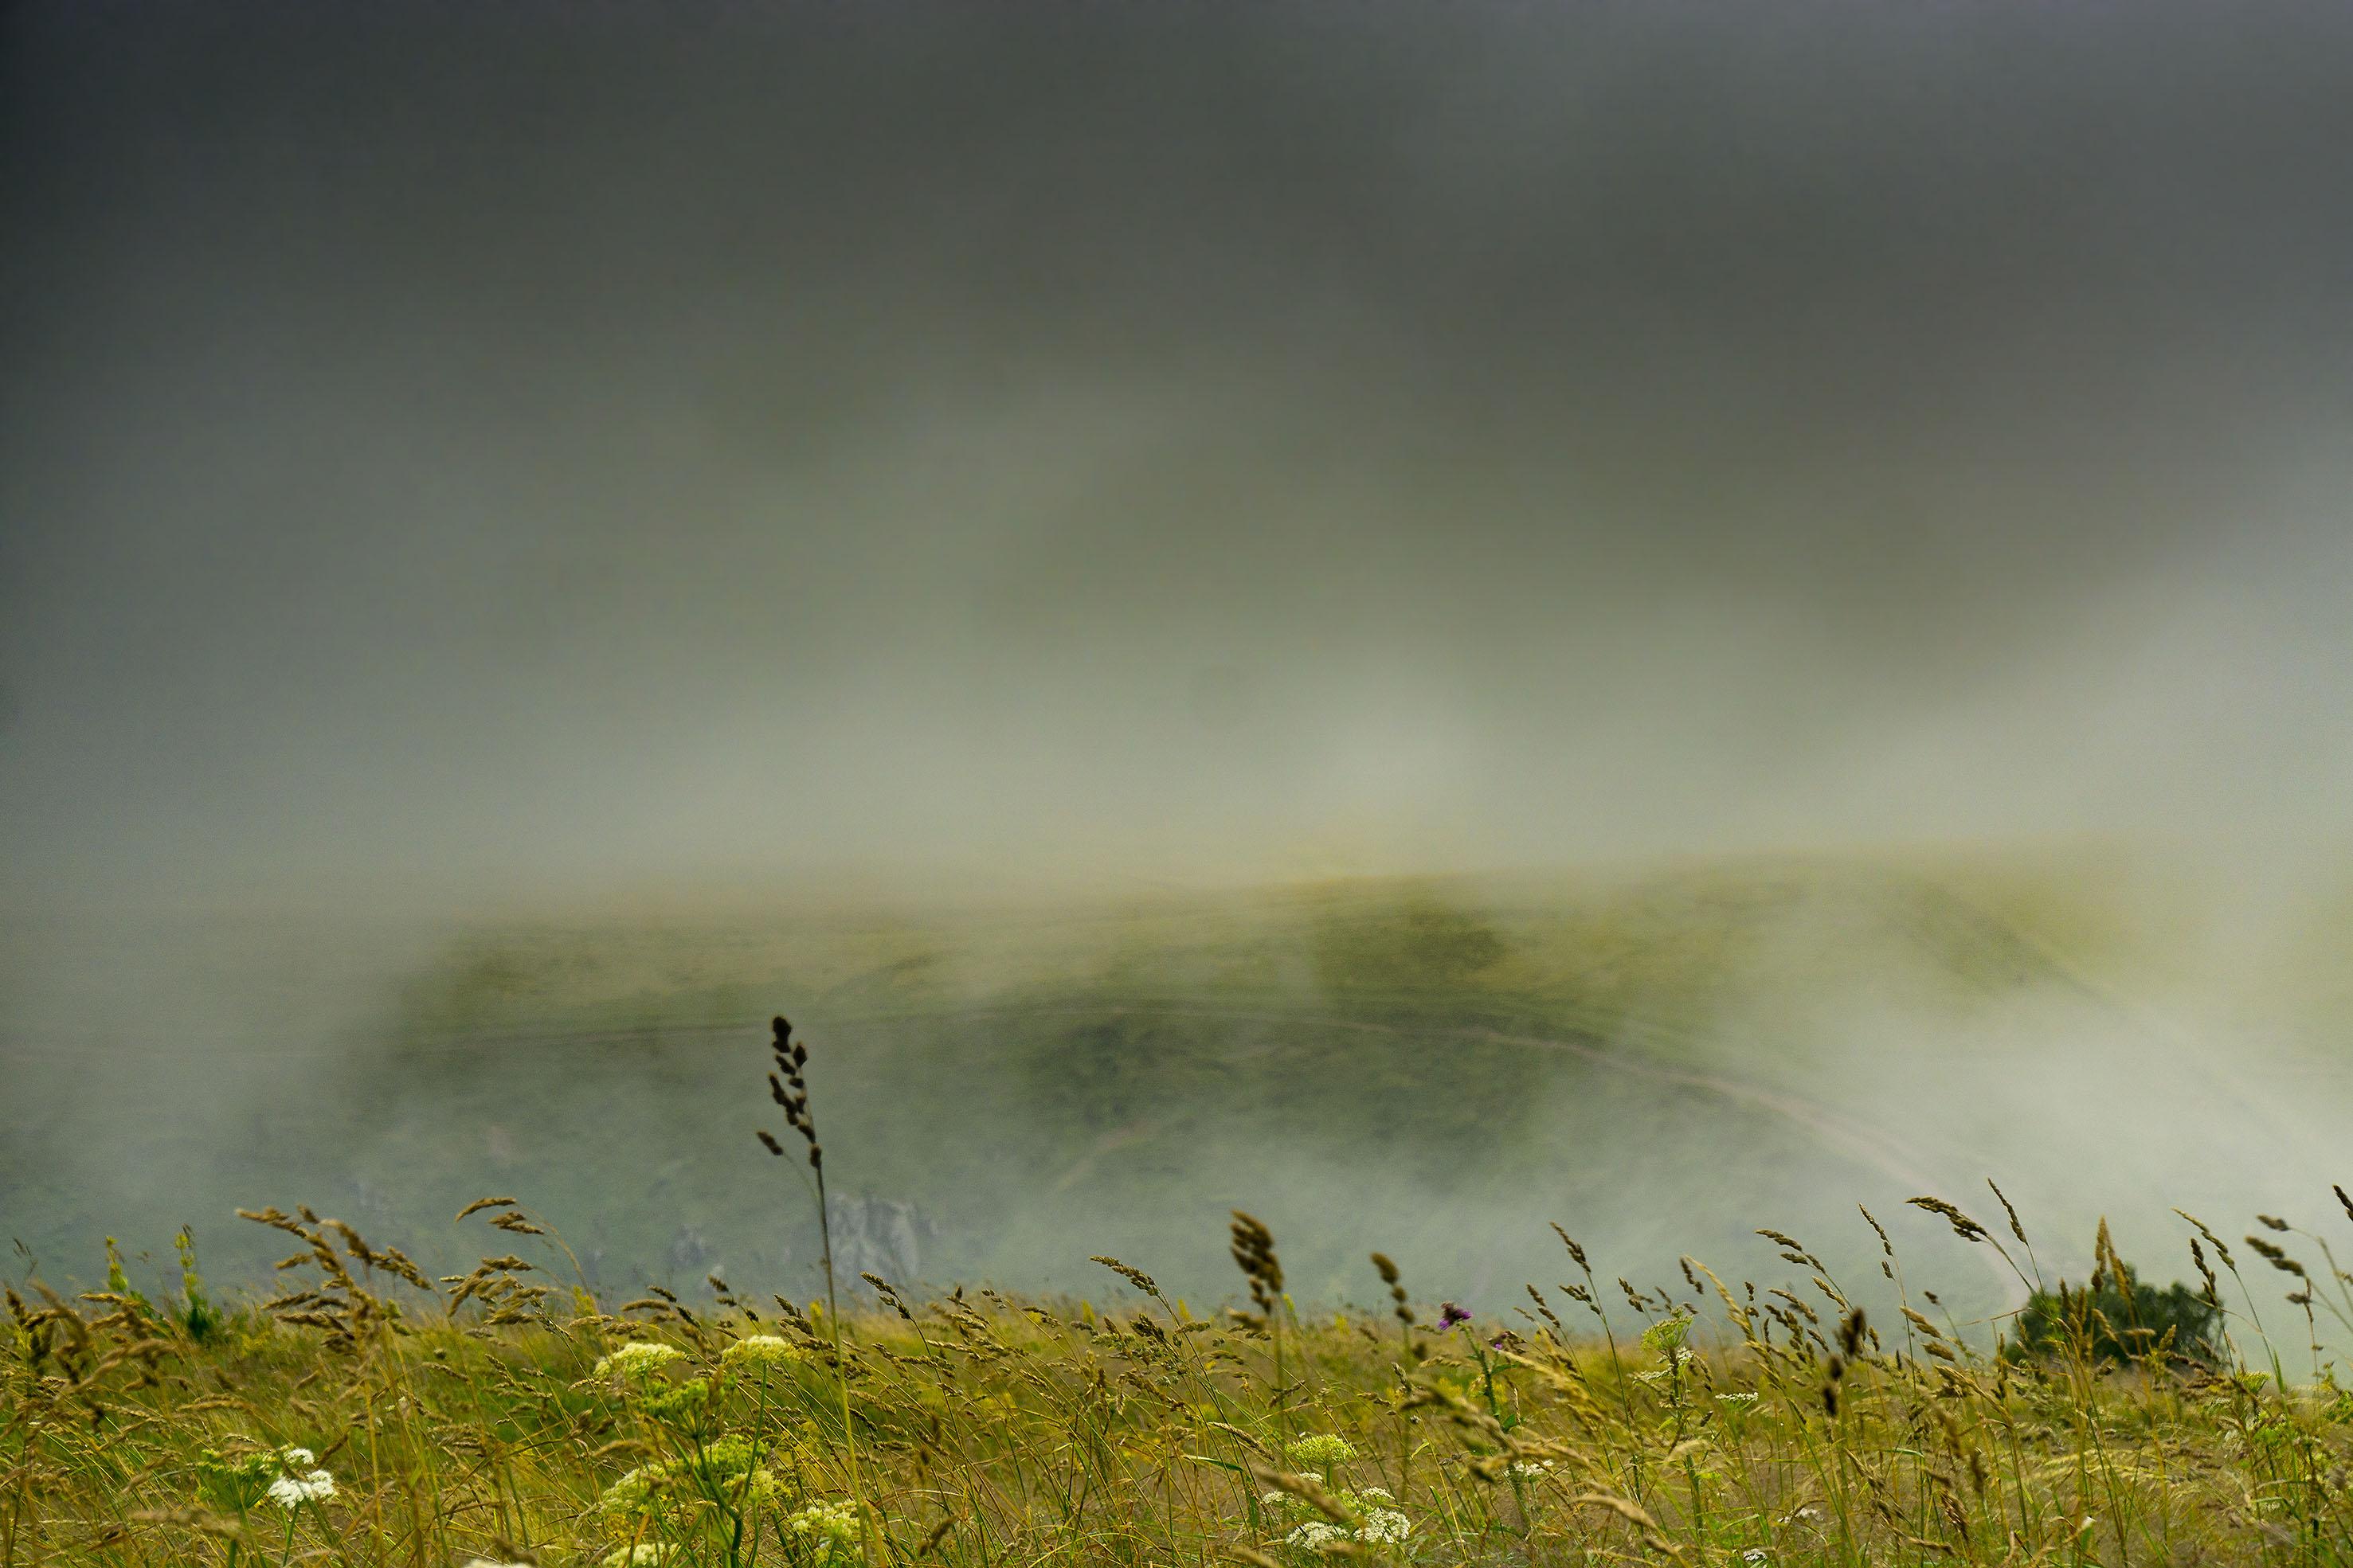 Arthur Los Fotografie - Zomerbeelden